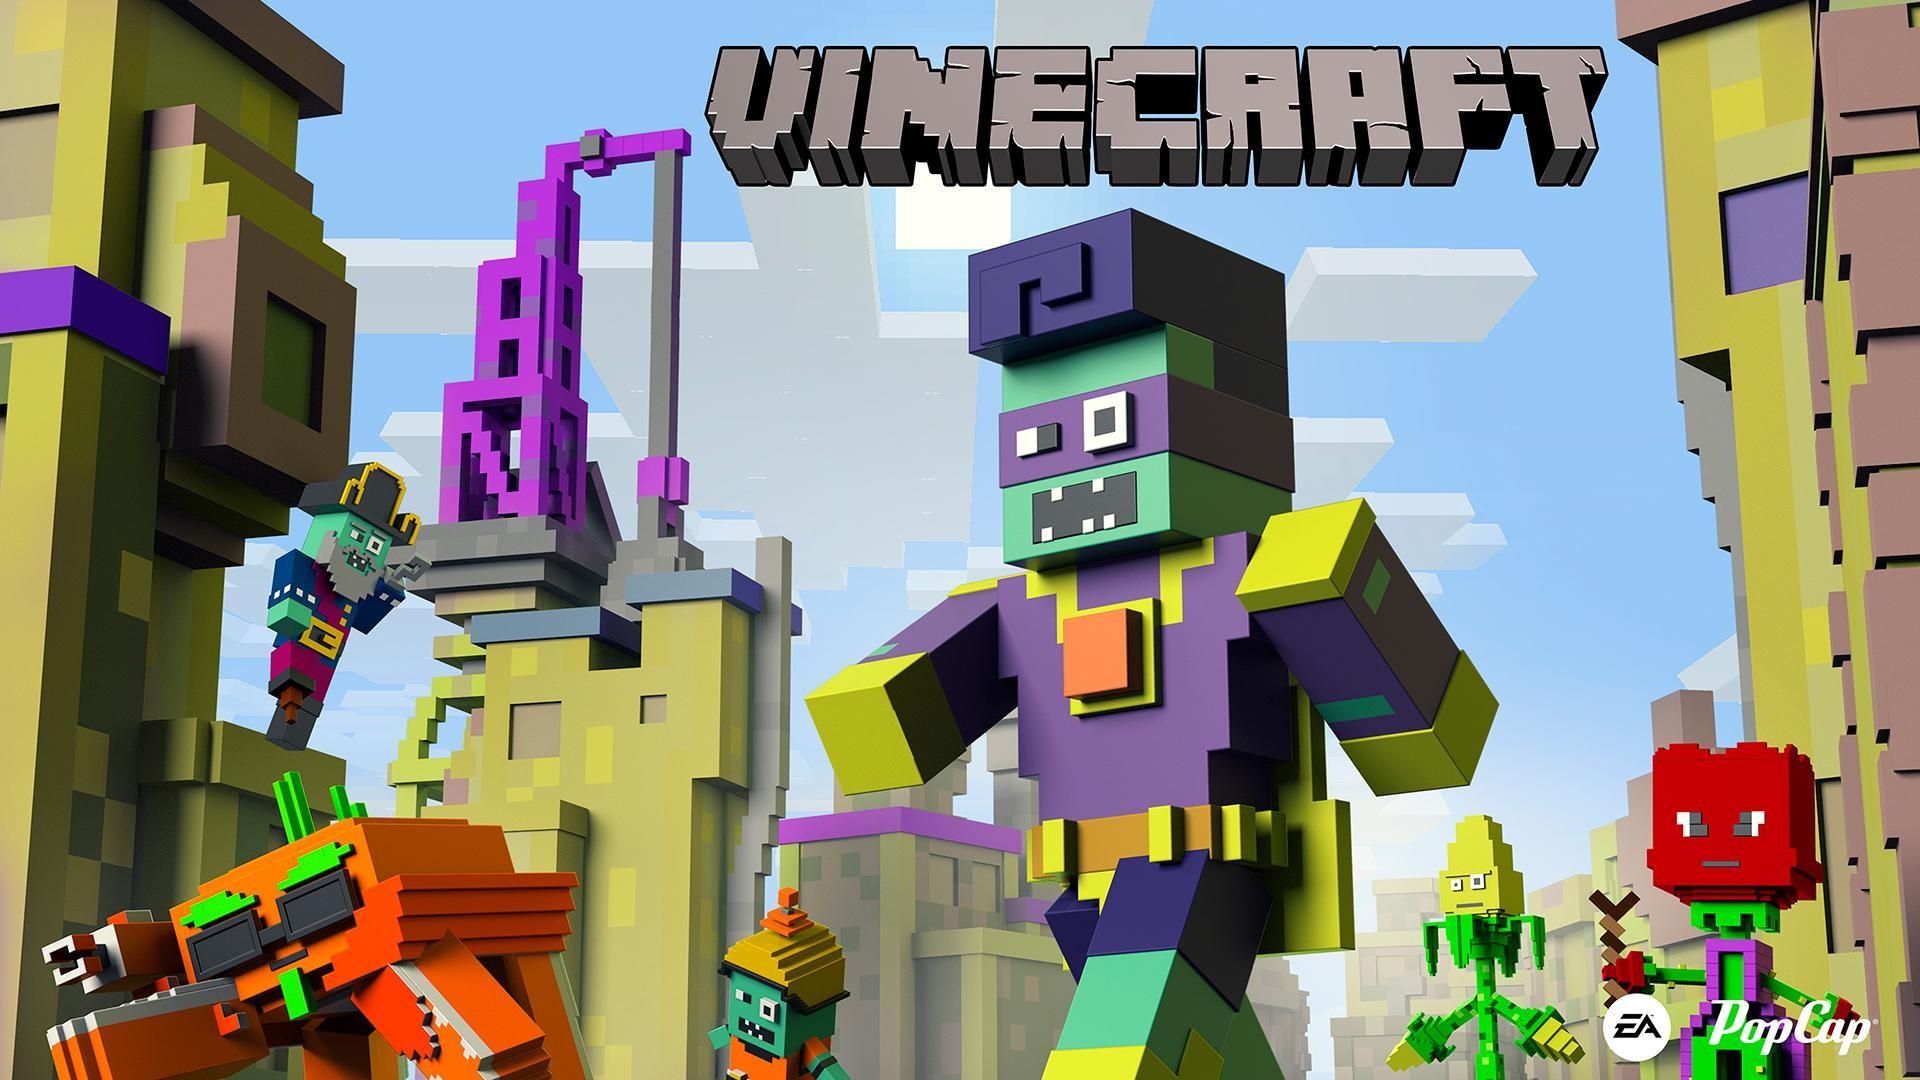 Minecraft Pvz Spoof Parody Full Hd Wallpaper And Background 1920x1080 Id 609548